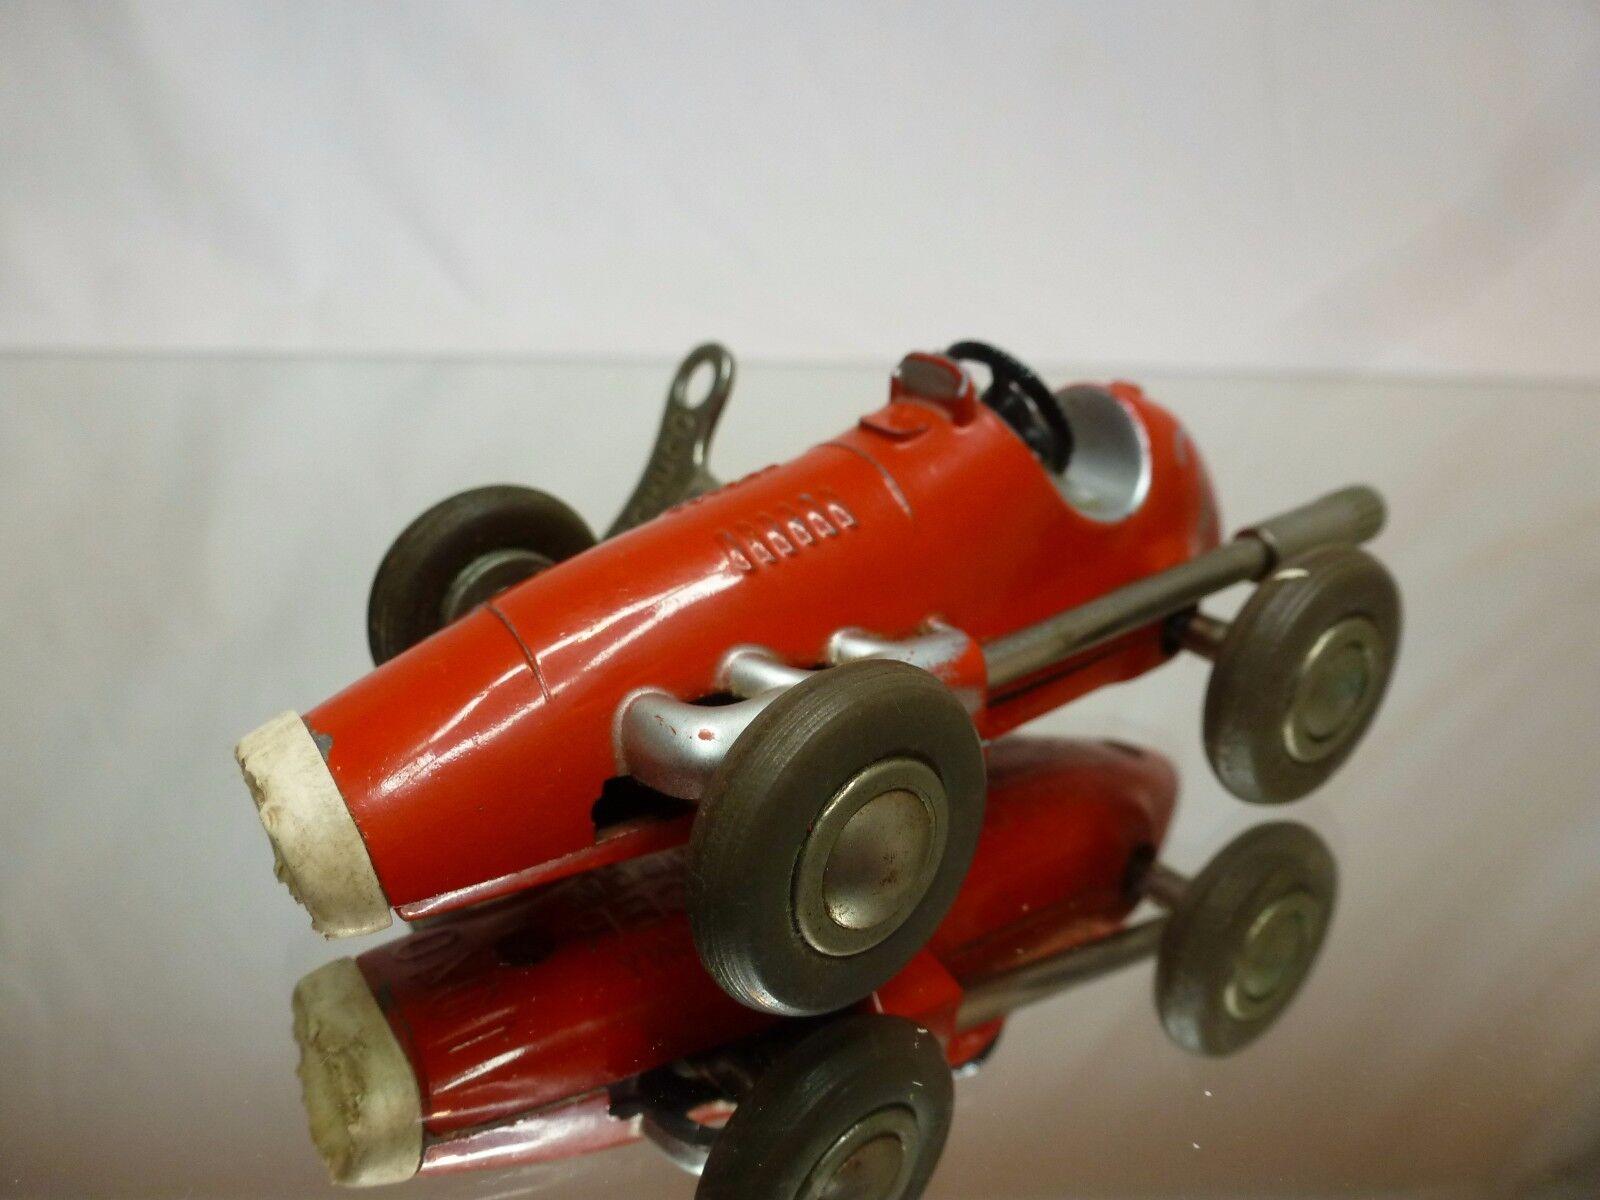 SCHUCO 1040 1040 1040 MICRO RACER + WINDUP KEY - rosso L9.0cm - GOOD CONDITION fb46fe